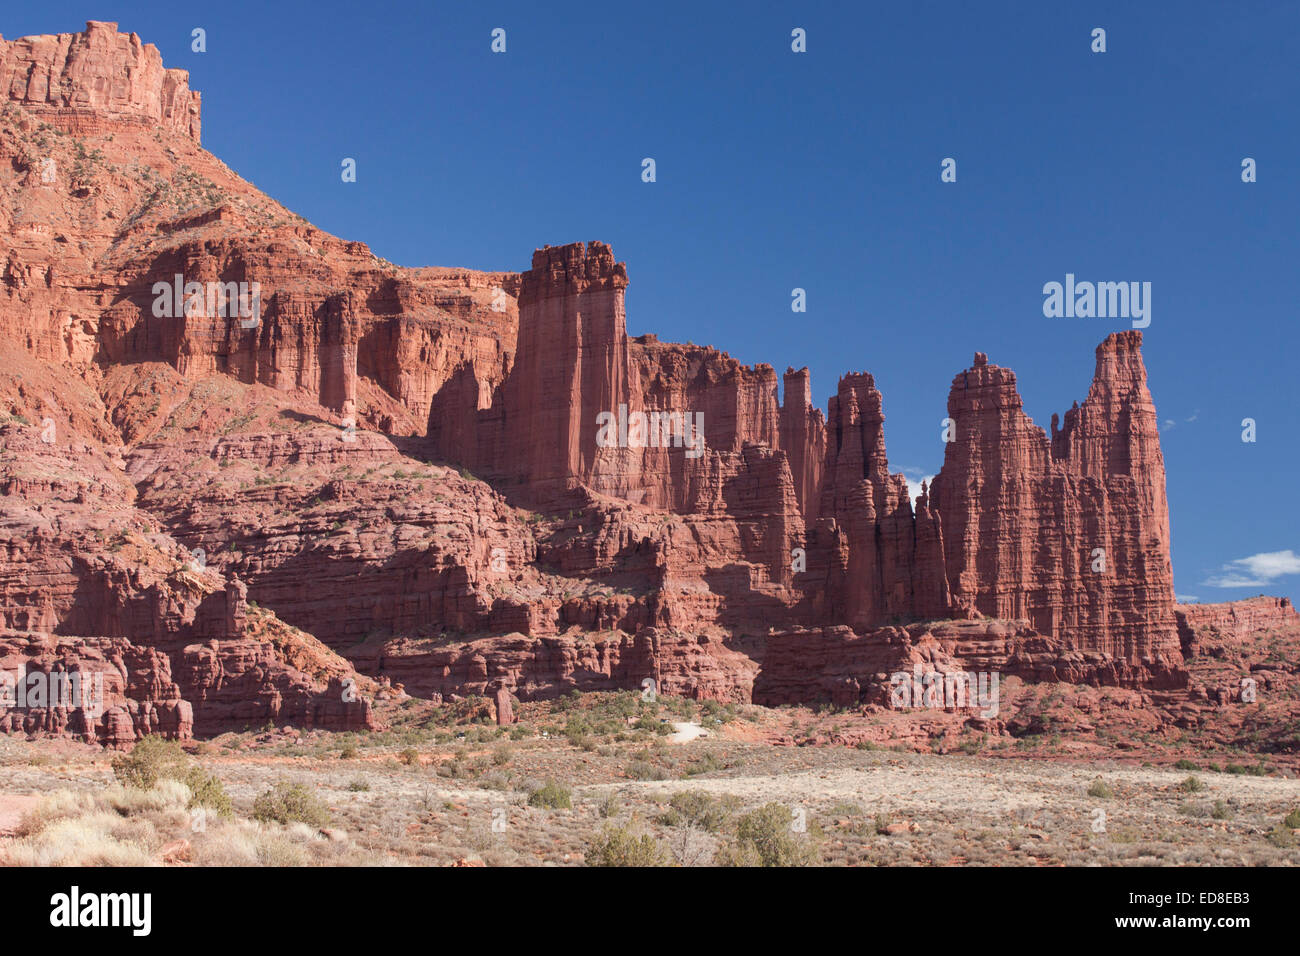 USA, Utah, near Moab, Highway 128, Fisher Towers - Stock Image